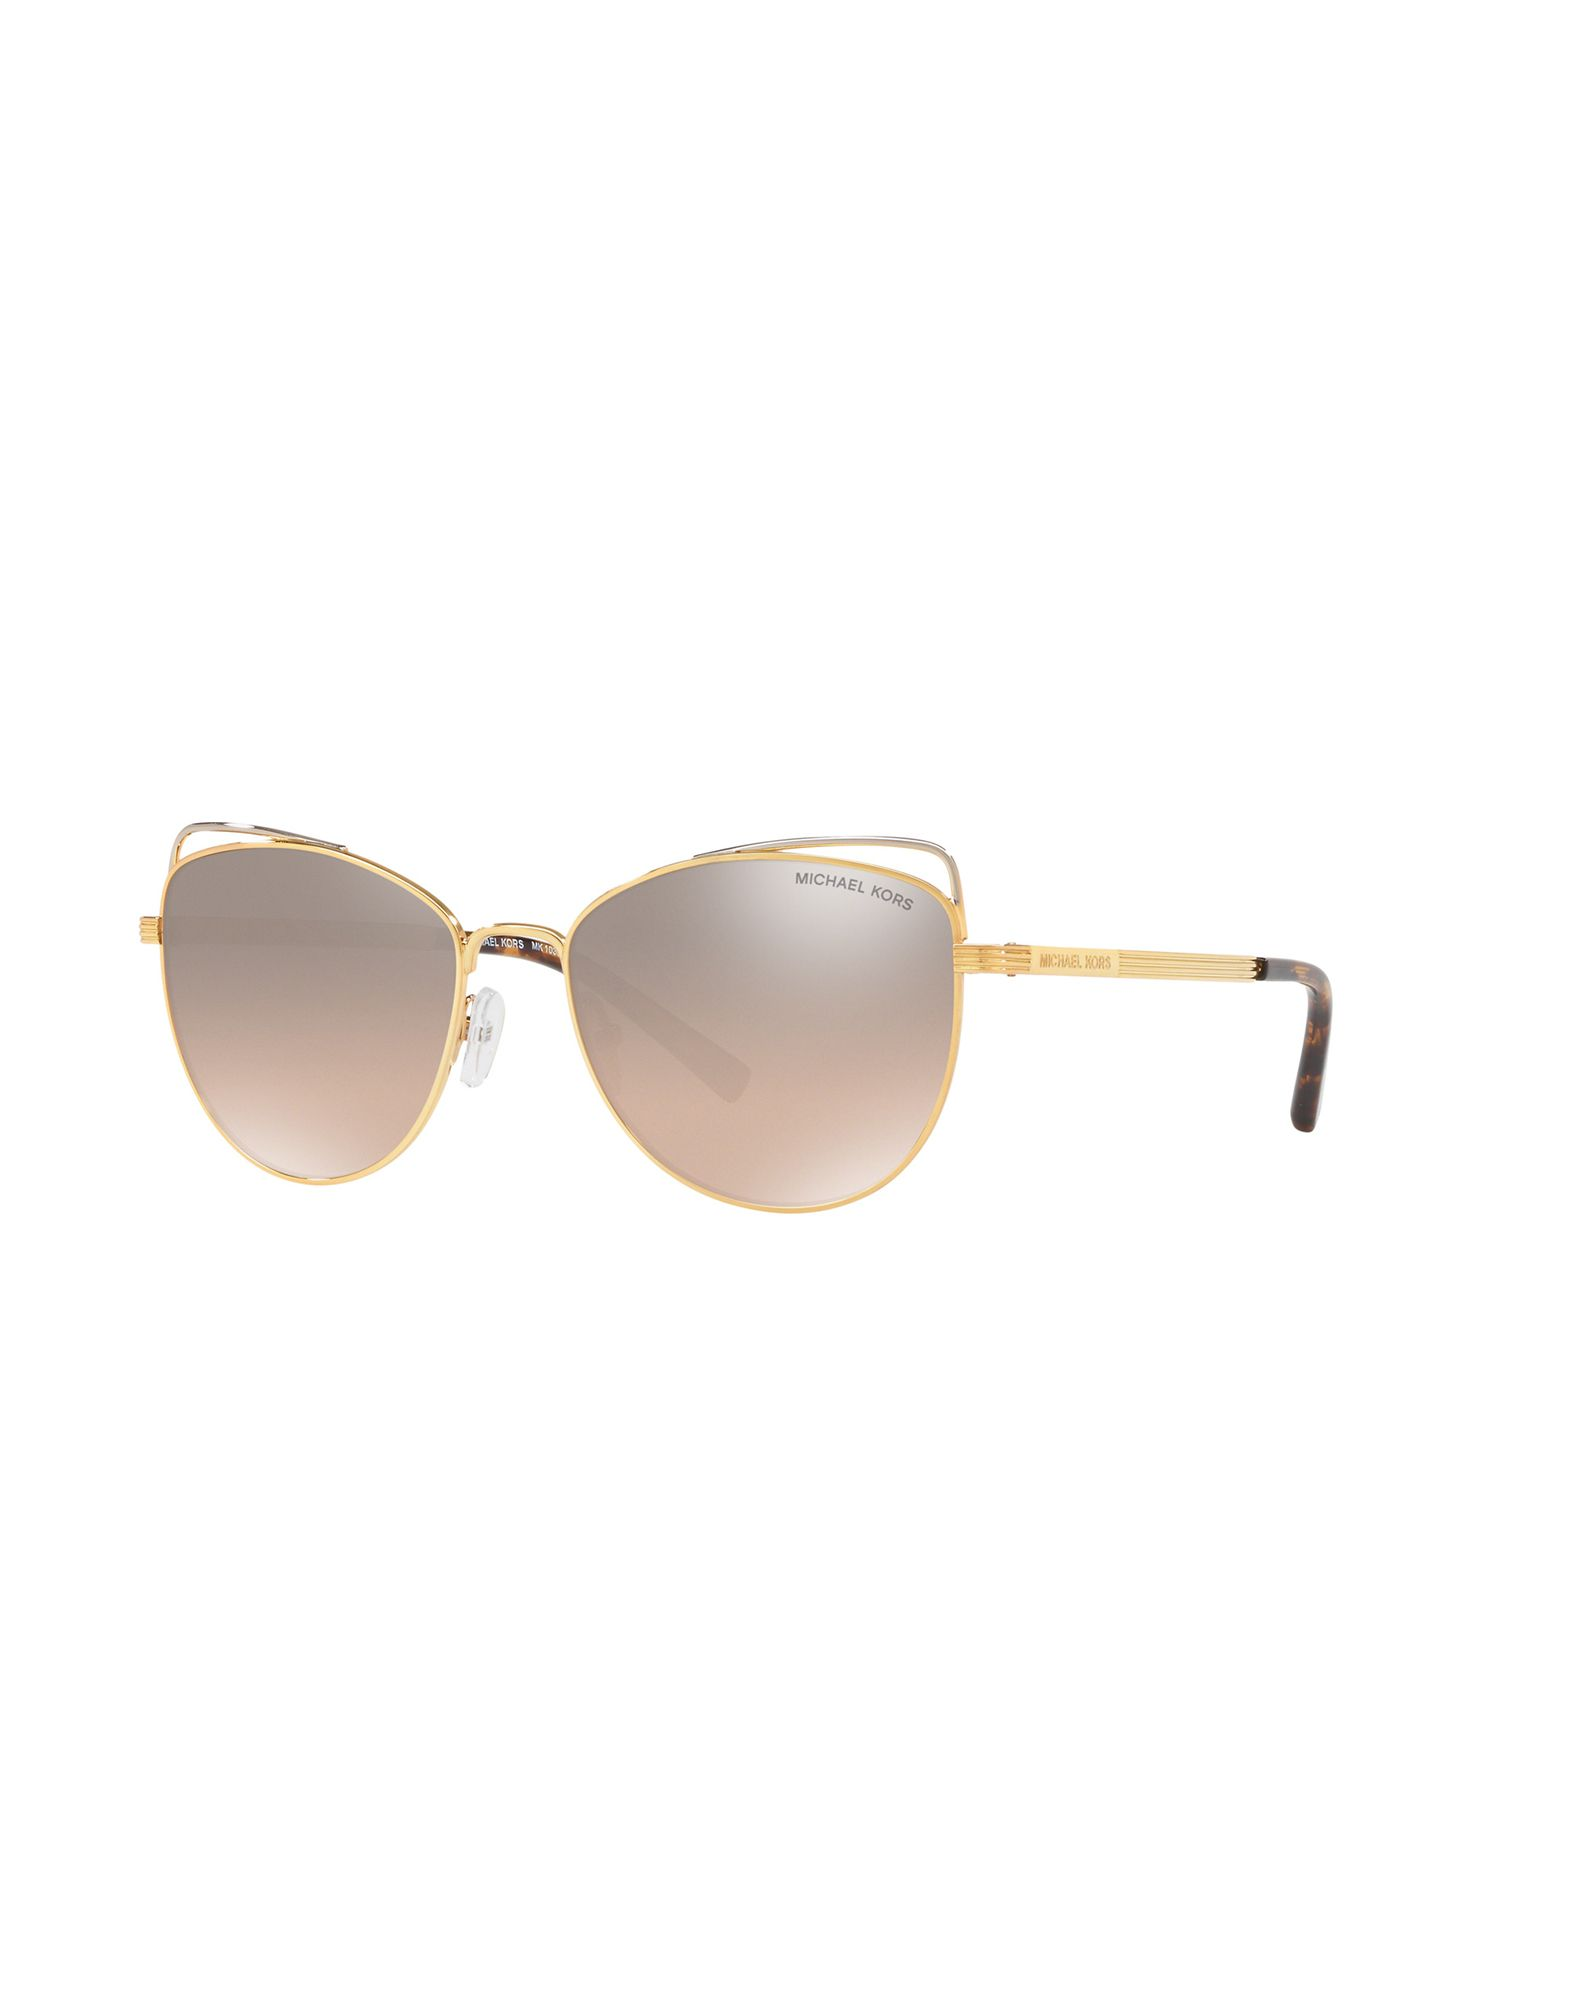 MICHAEL KORS Солнечные очки очки солнцезащитные michael kors mk2037 32094l